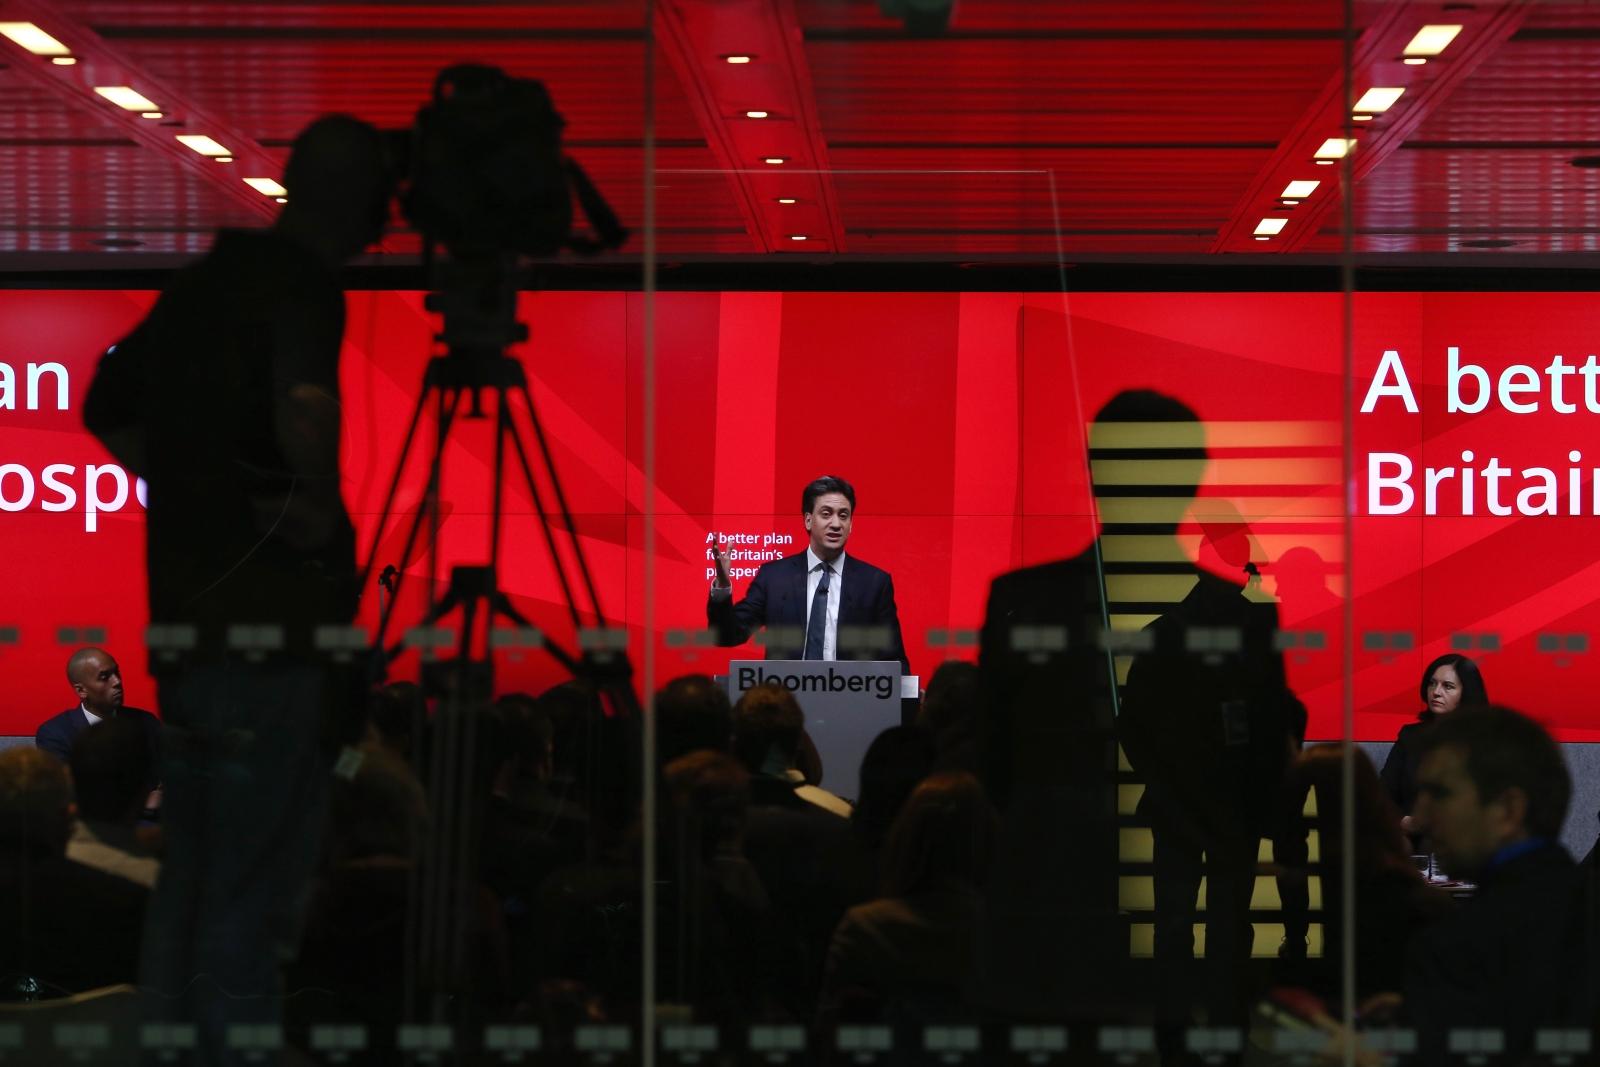 Ed Miliband Bloomberg Speech